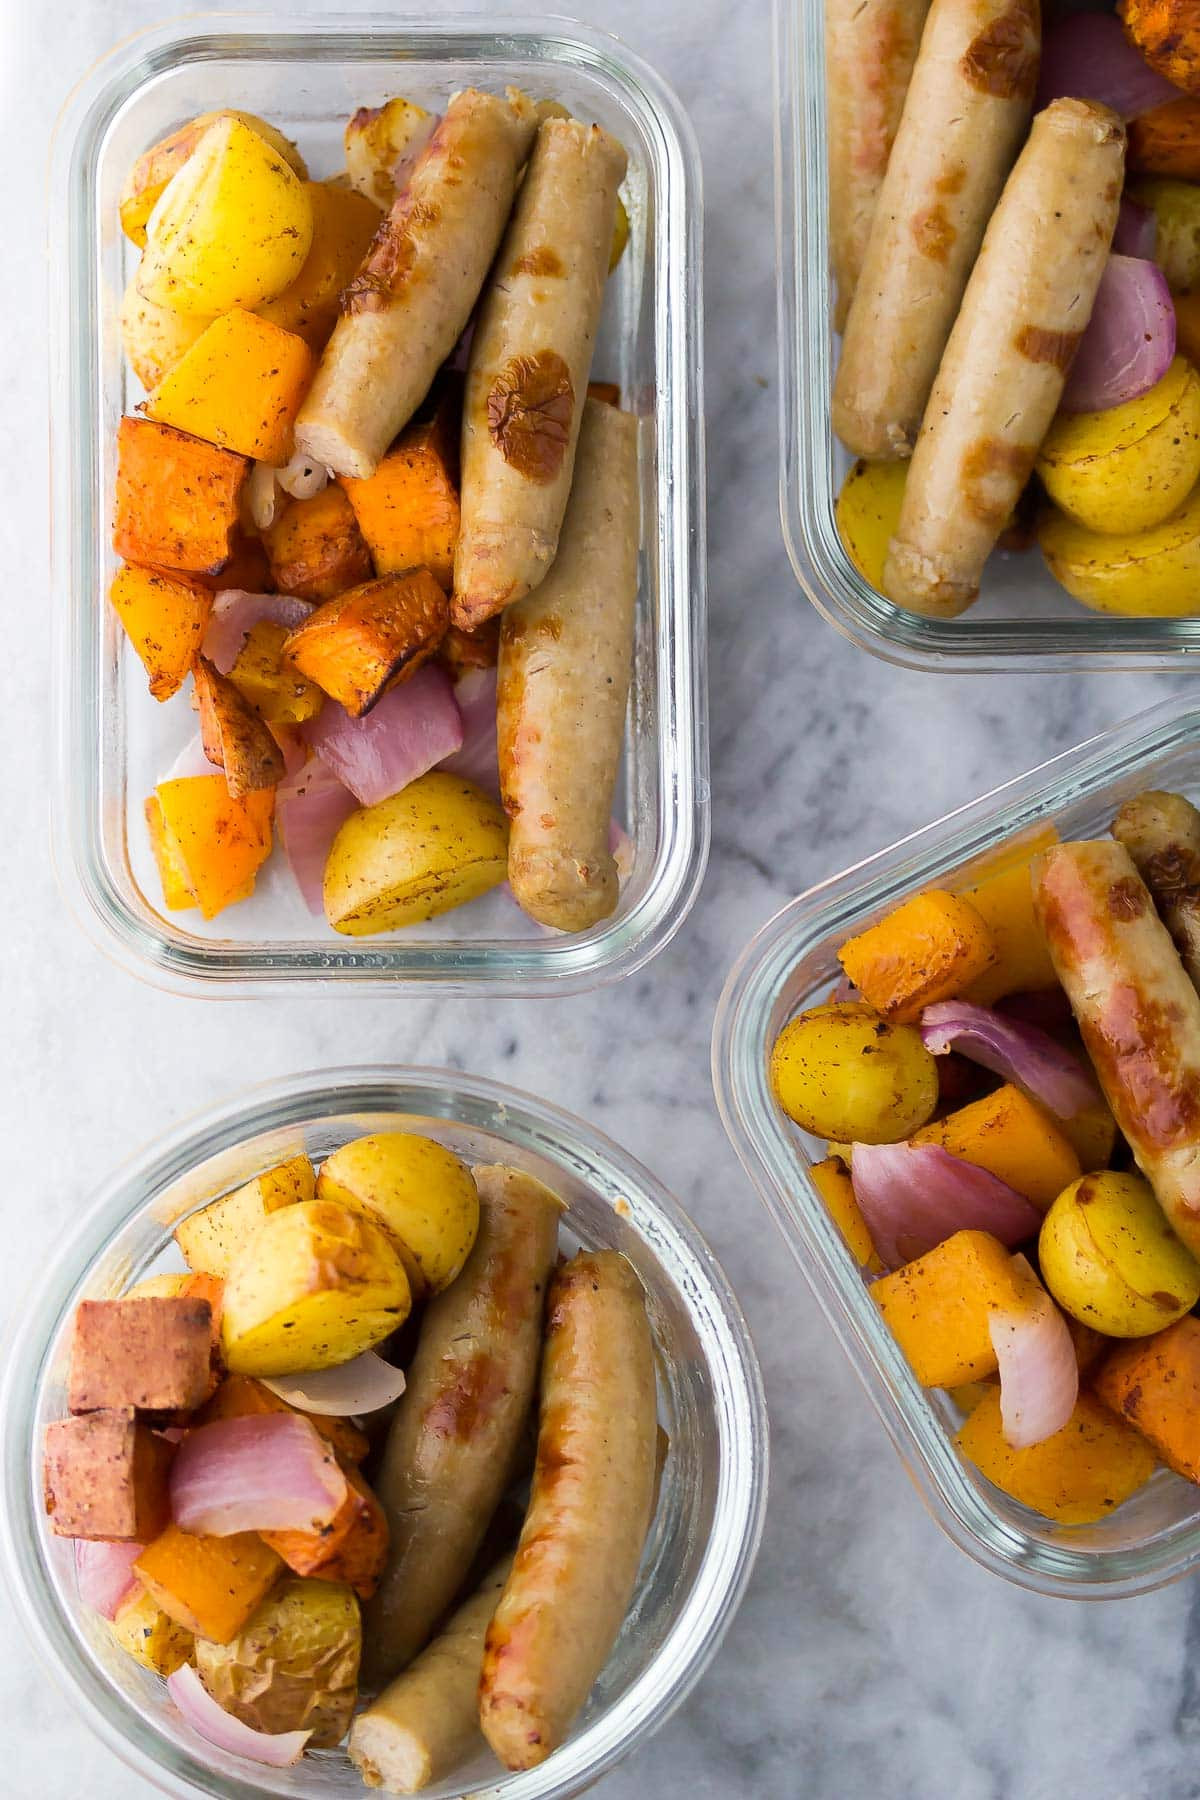 Healthy Breakfast Sausage Recipe  Make Ahead Healthy Sausage Breakfast Bowls